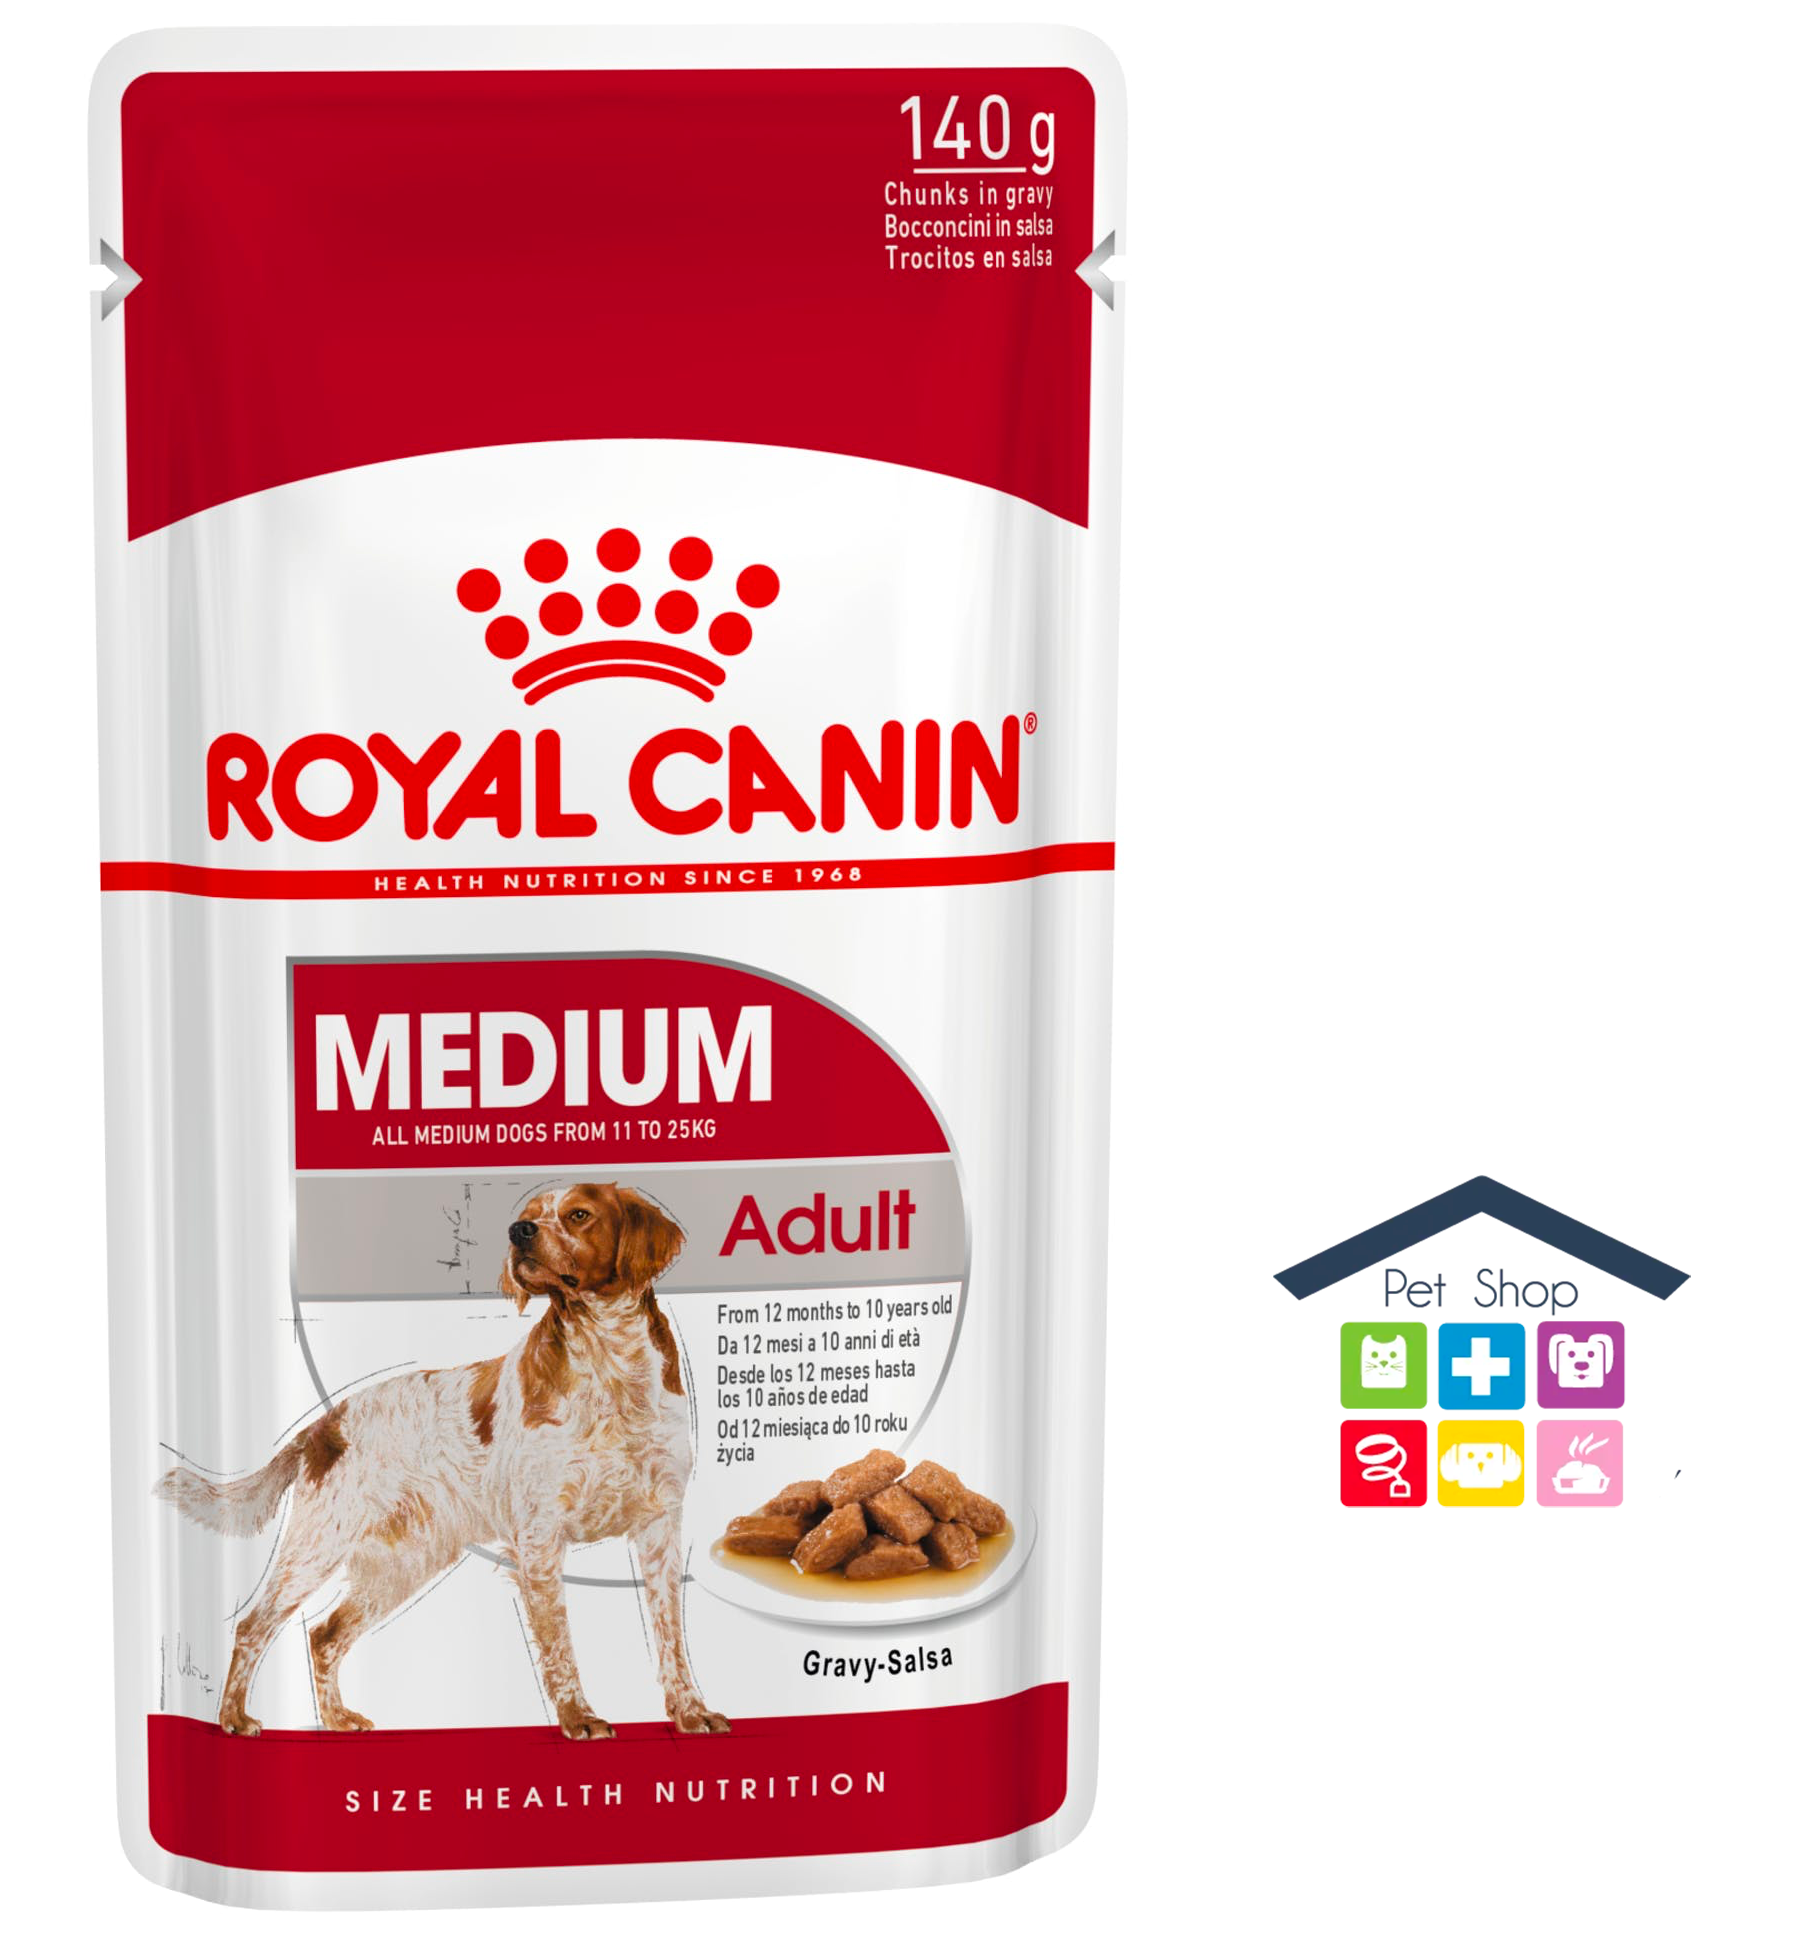 Royal Canin Cane | Linea Size HN | MEDIUM Adult / 140g Bustina